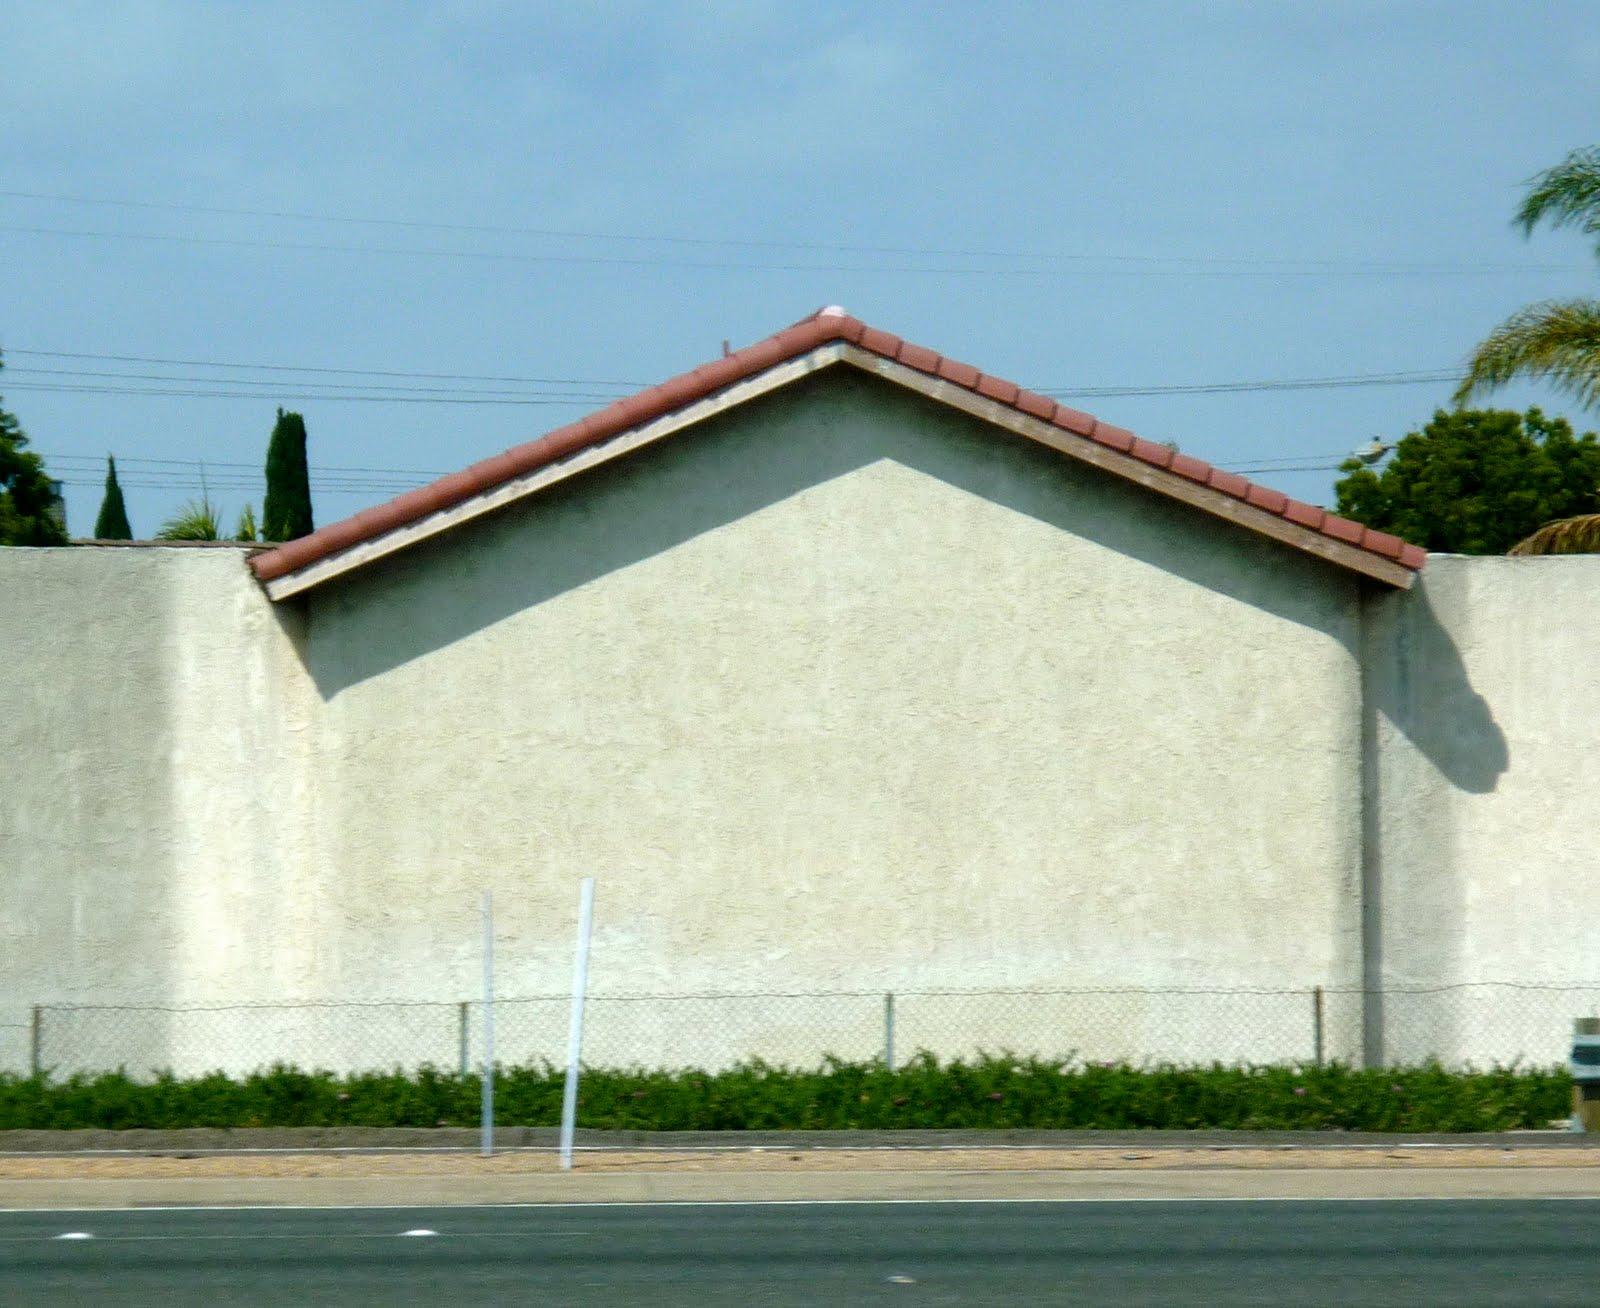 Green Laker: California Curiosity - Houses & Noise Barrier Combo